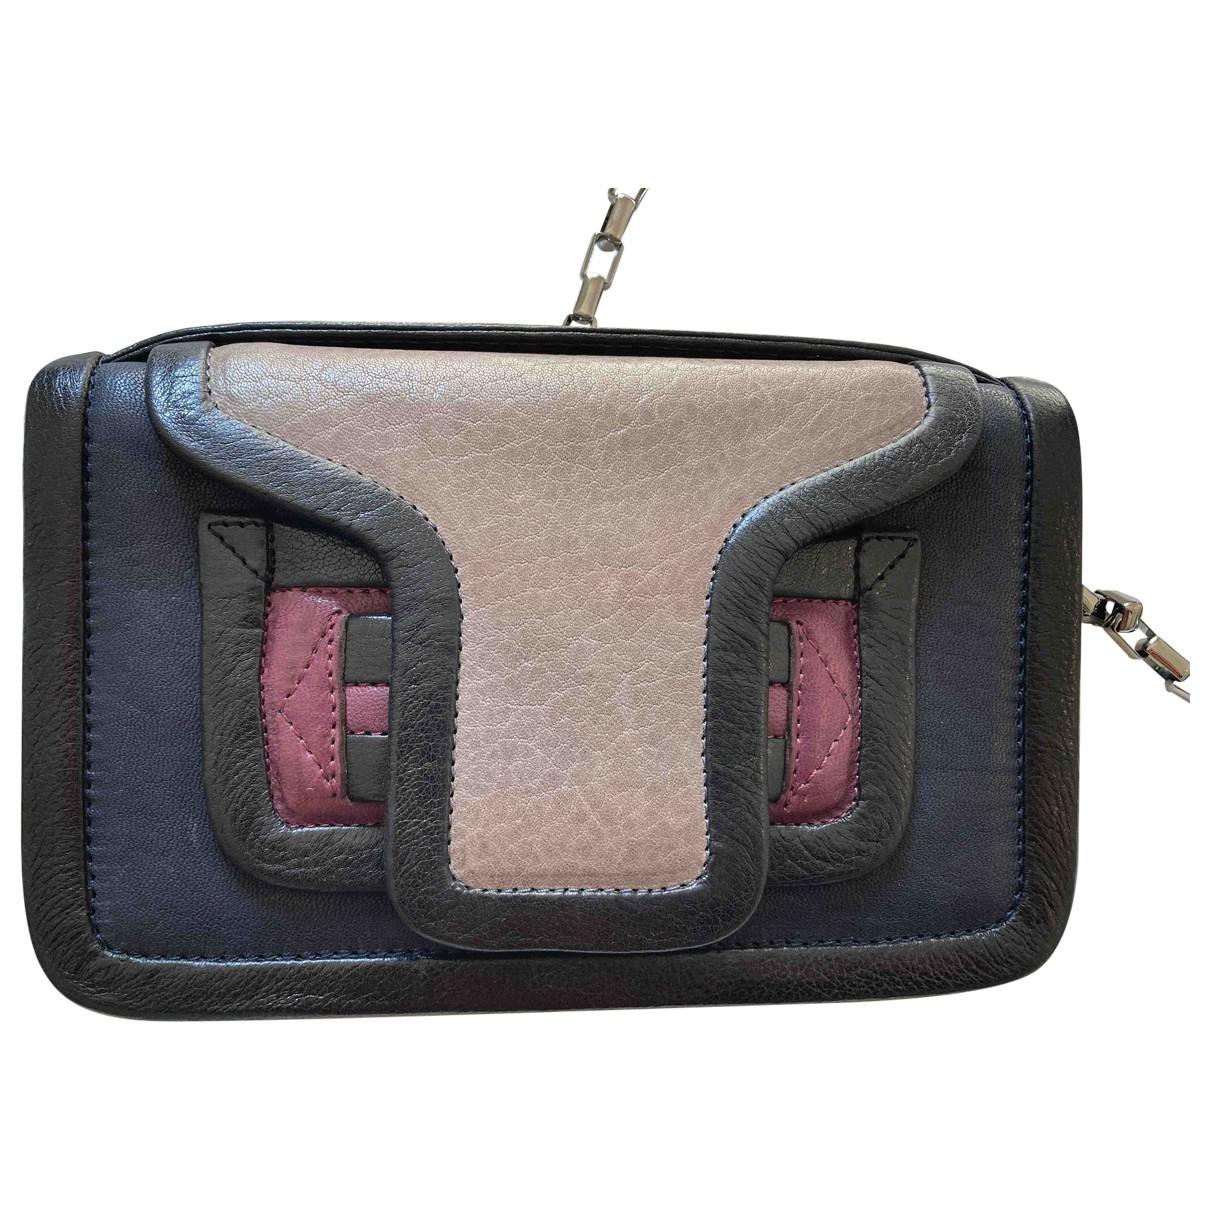 Pierre Hardy N Multicolour Leather handbag for Women N